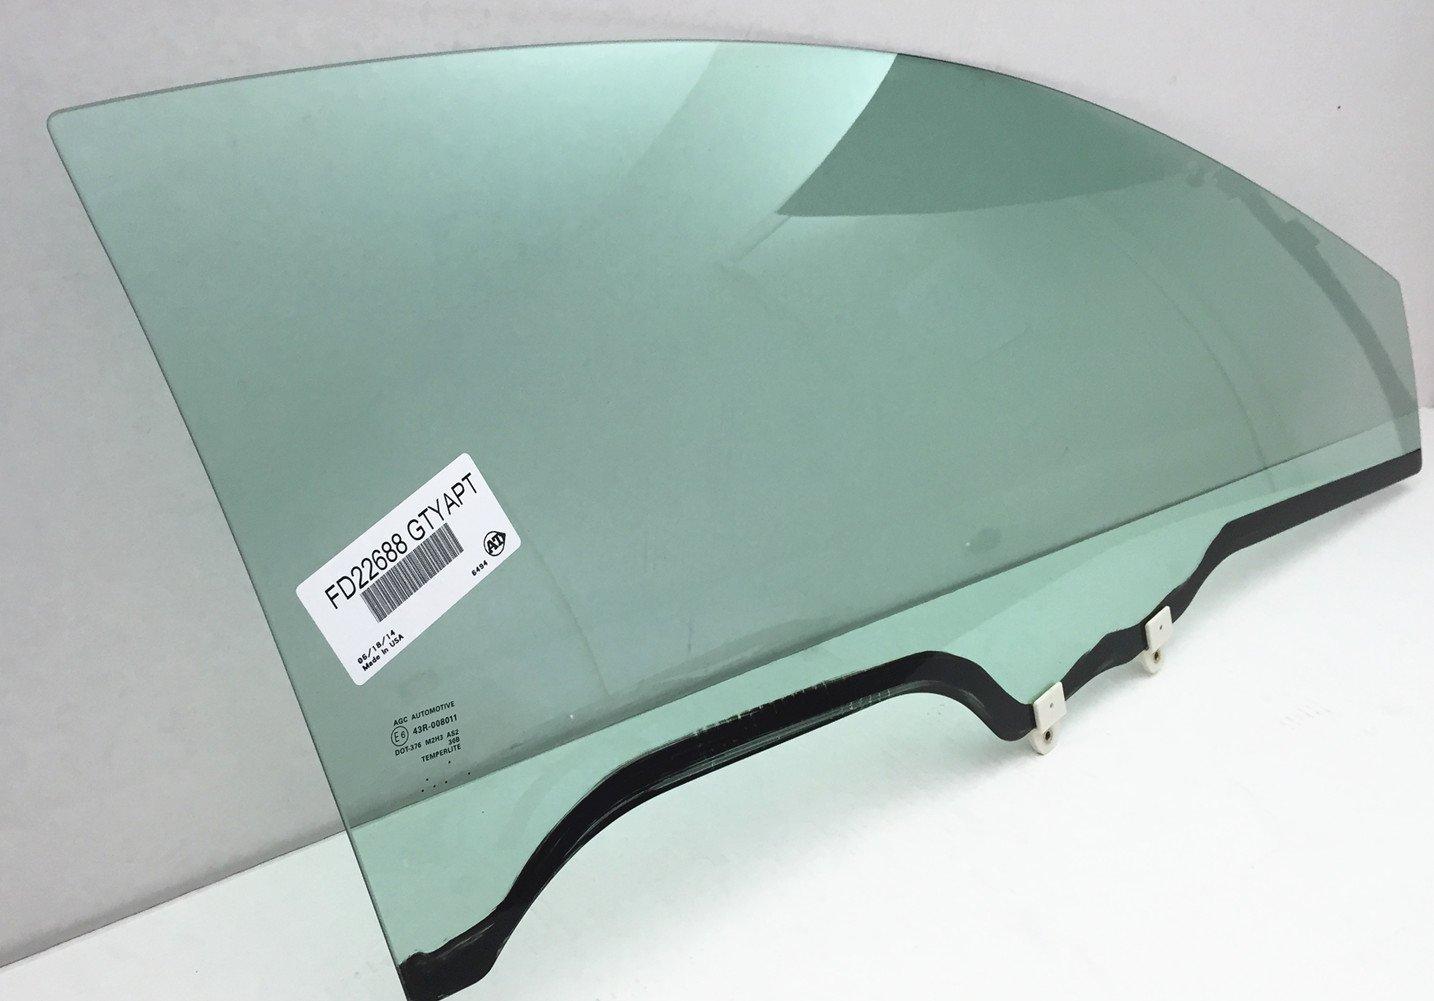 NAGD Fits 2006-2011 Honda Civic 2Door Coupe Passenger Side Right Front Door Window Glass FD22688GTY